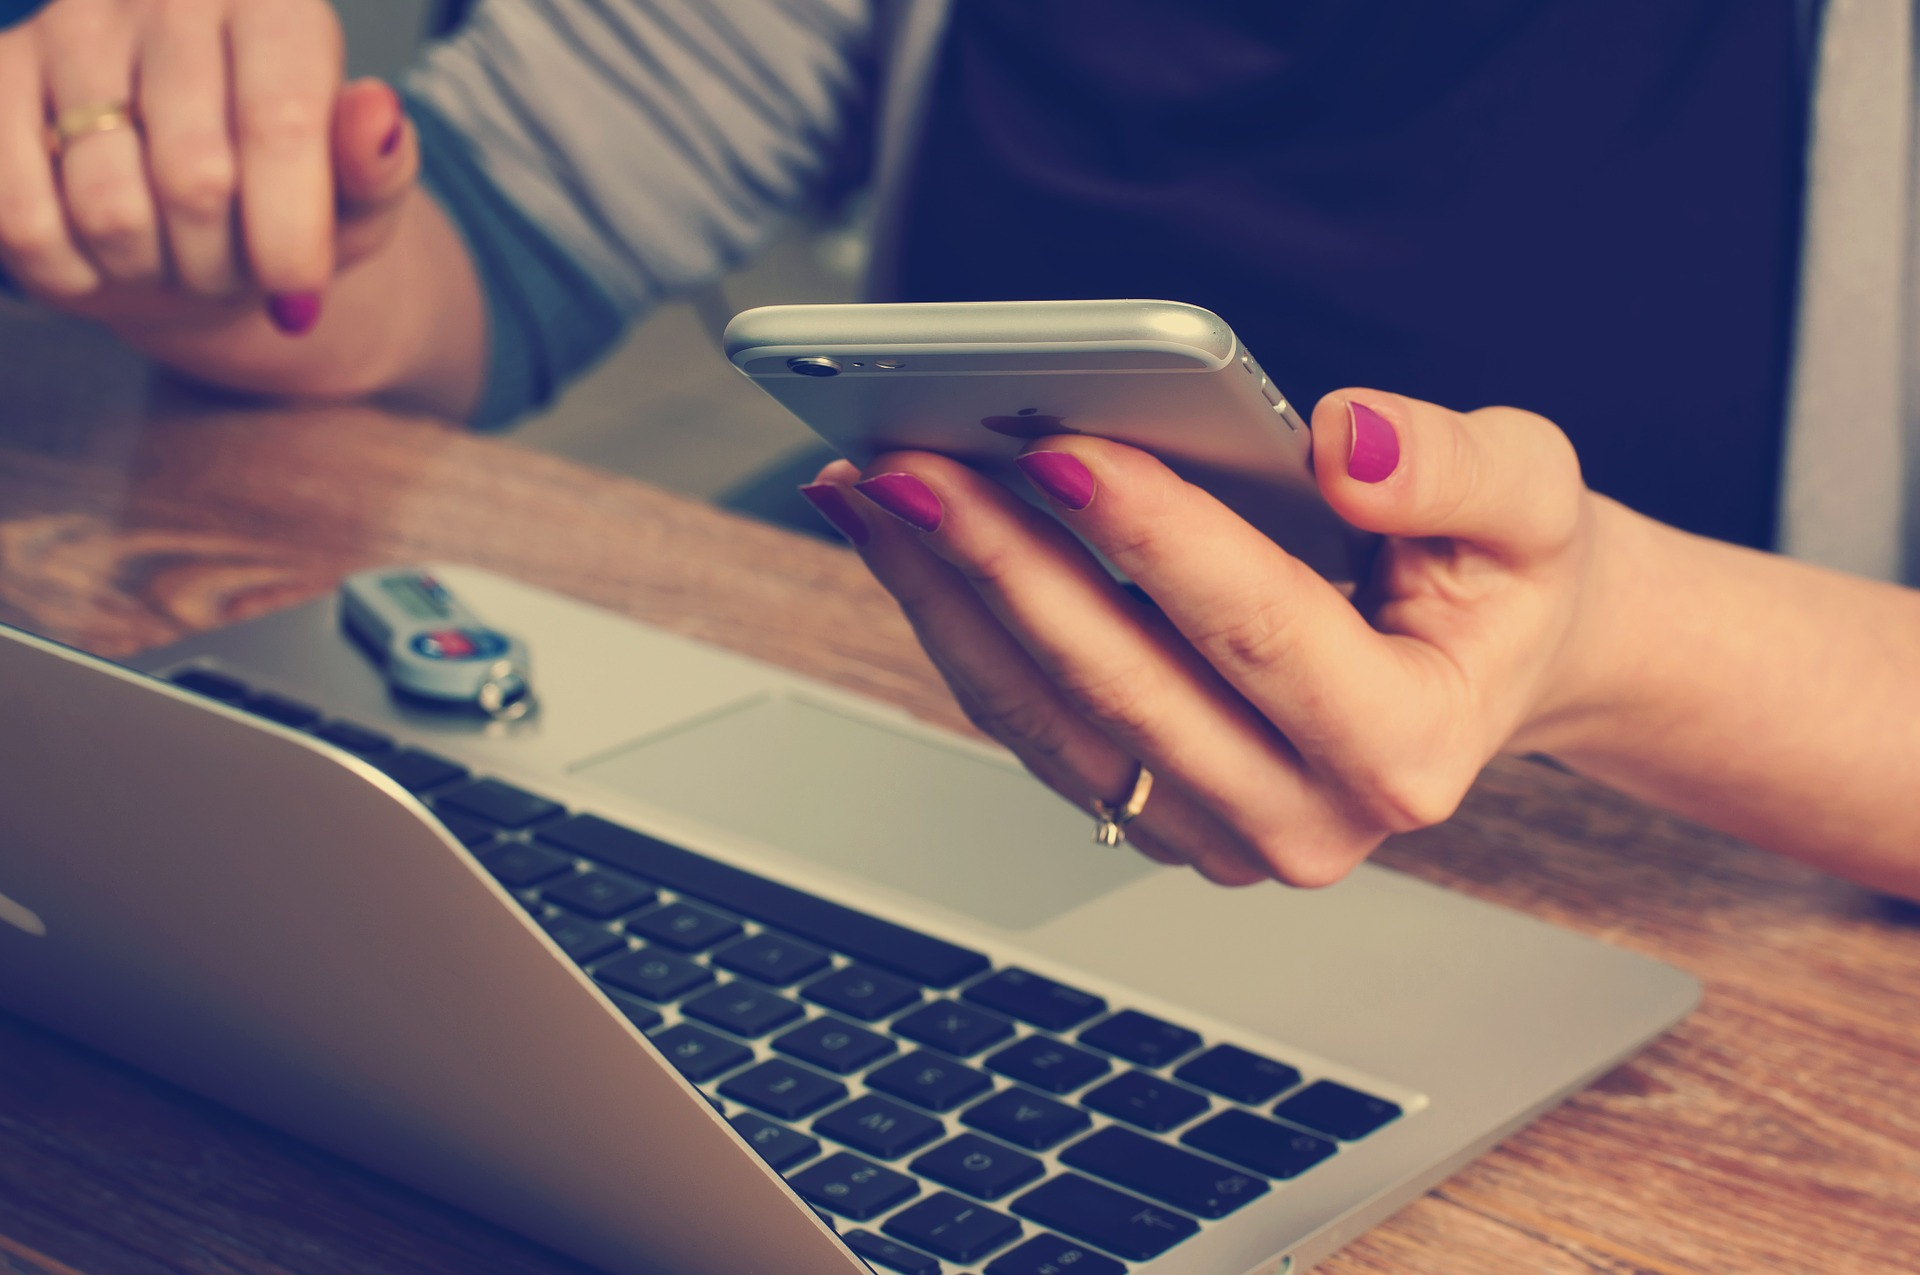 Digital detox and multitasking